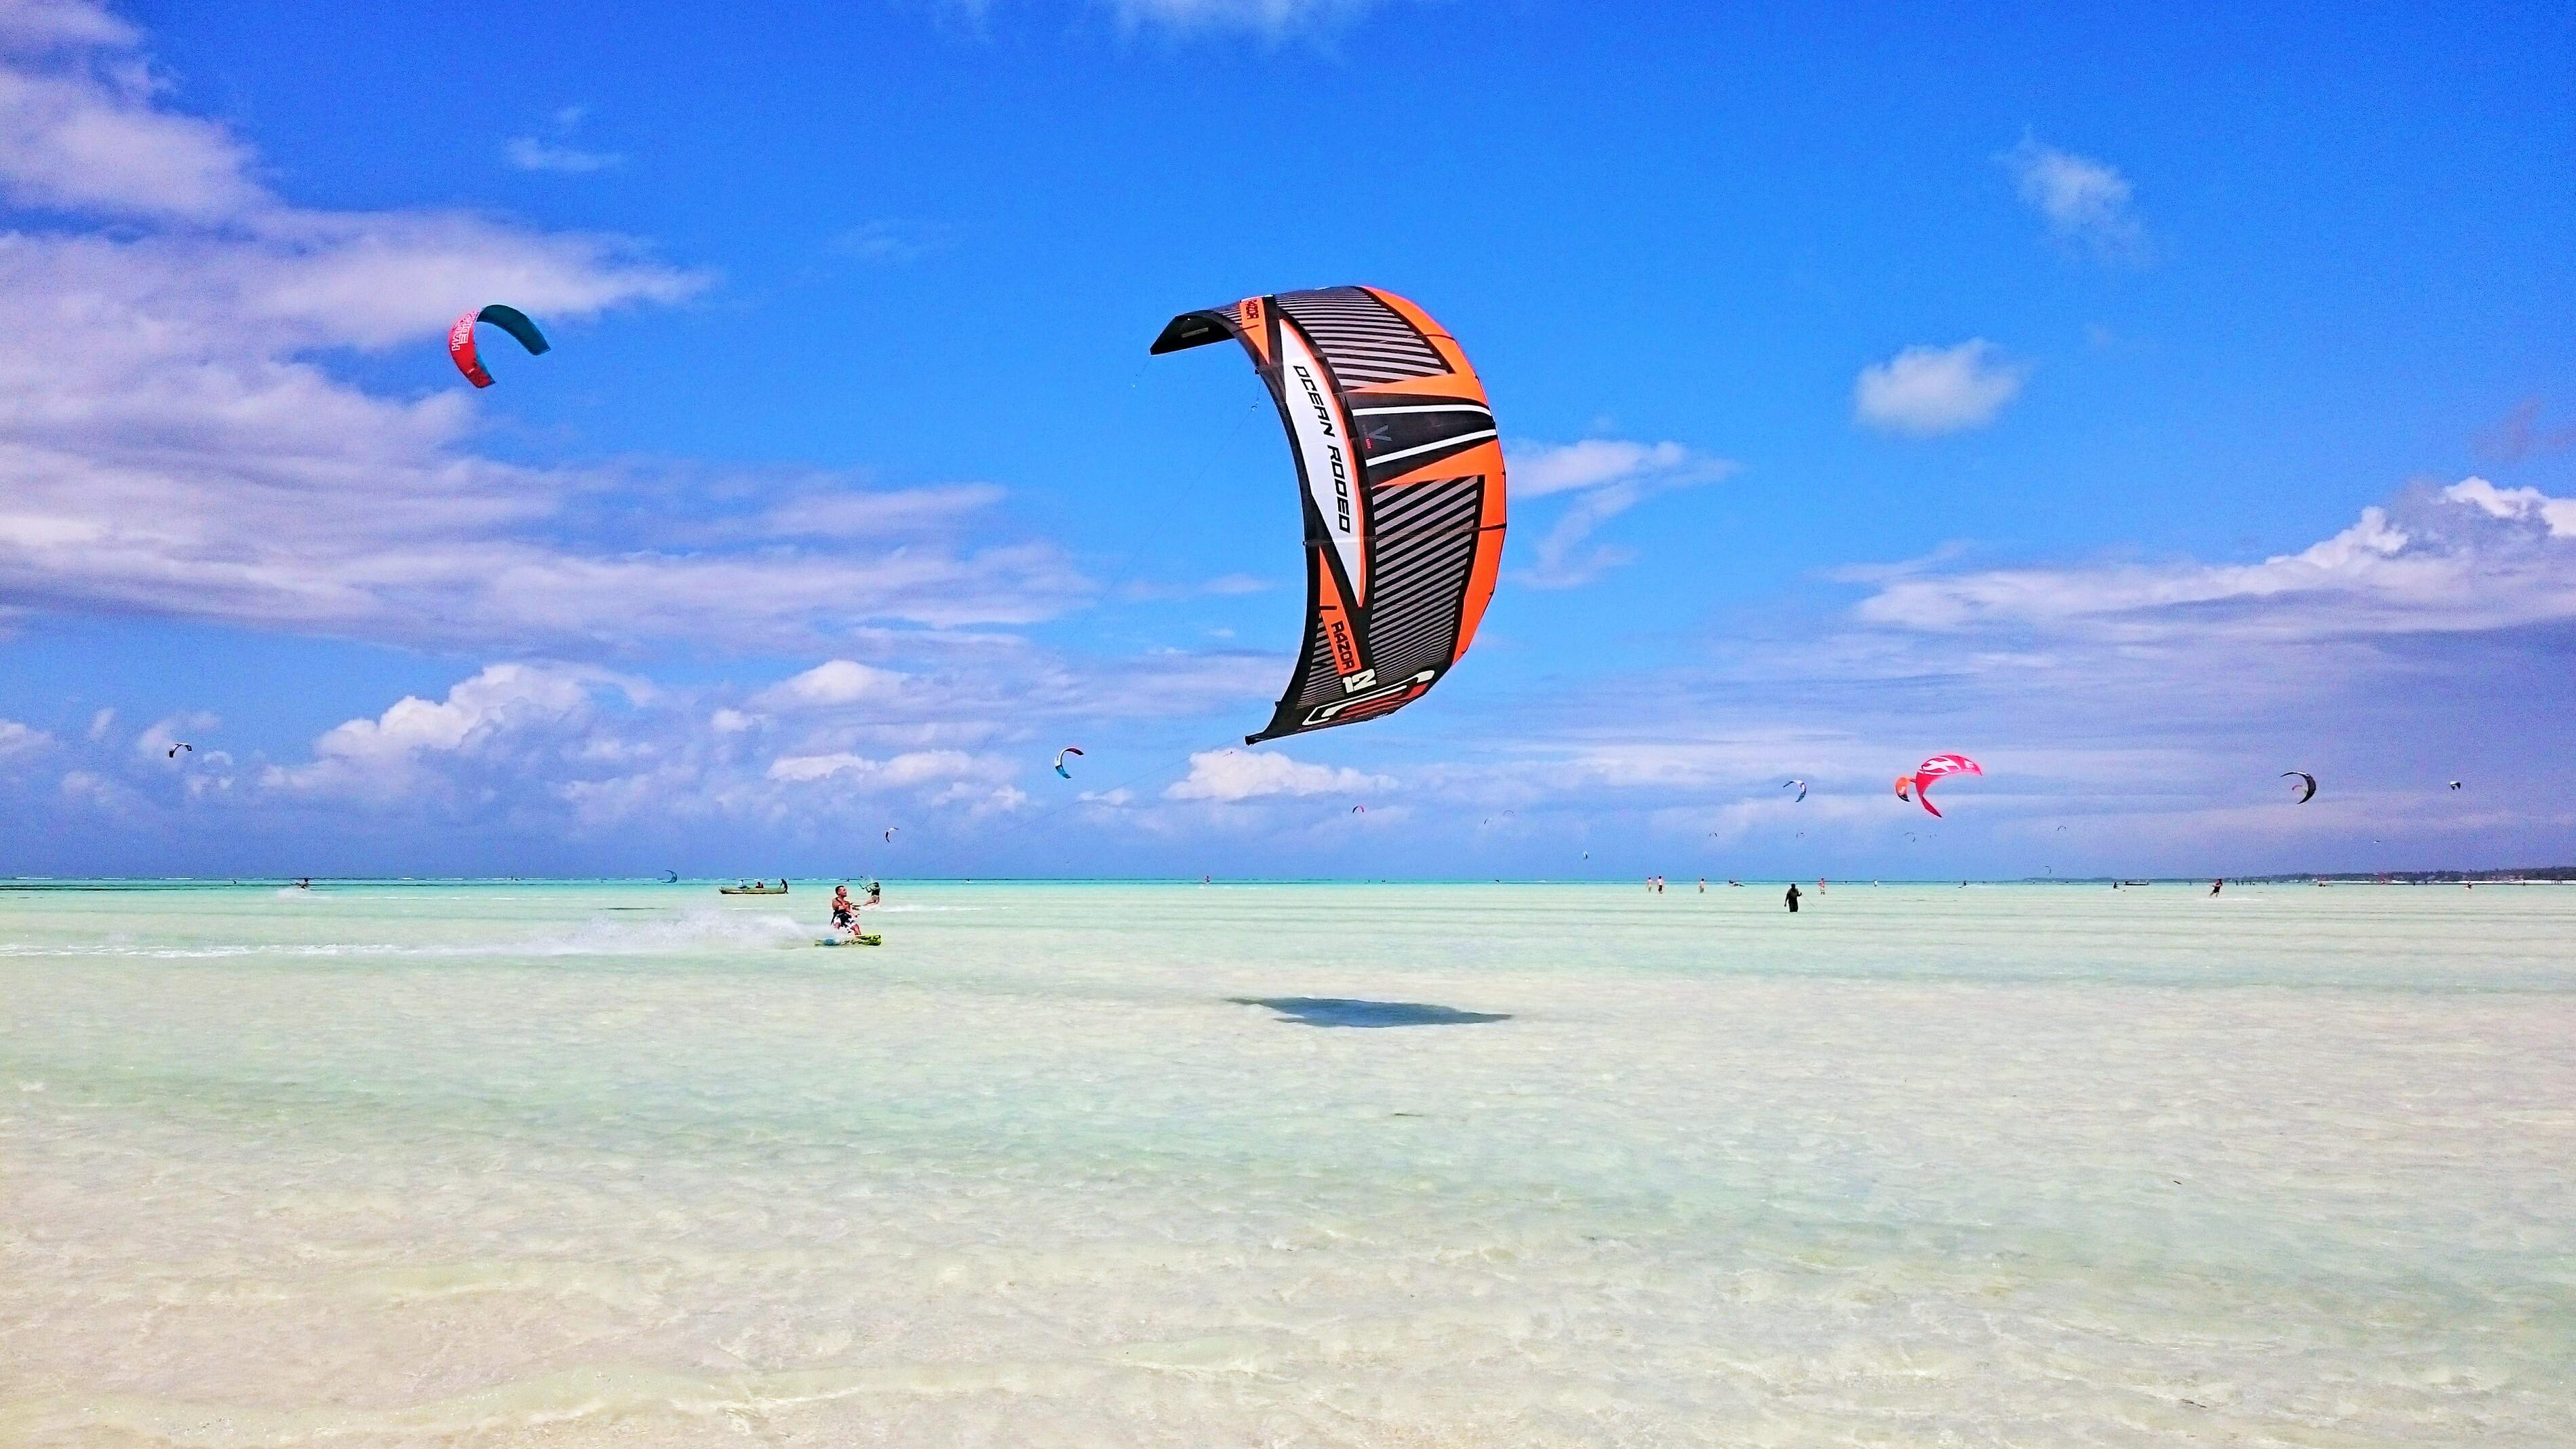 Copyright_Airborne Kite & Surf Centres_1